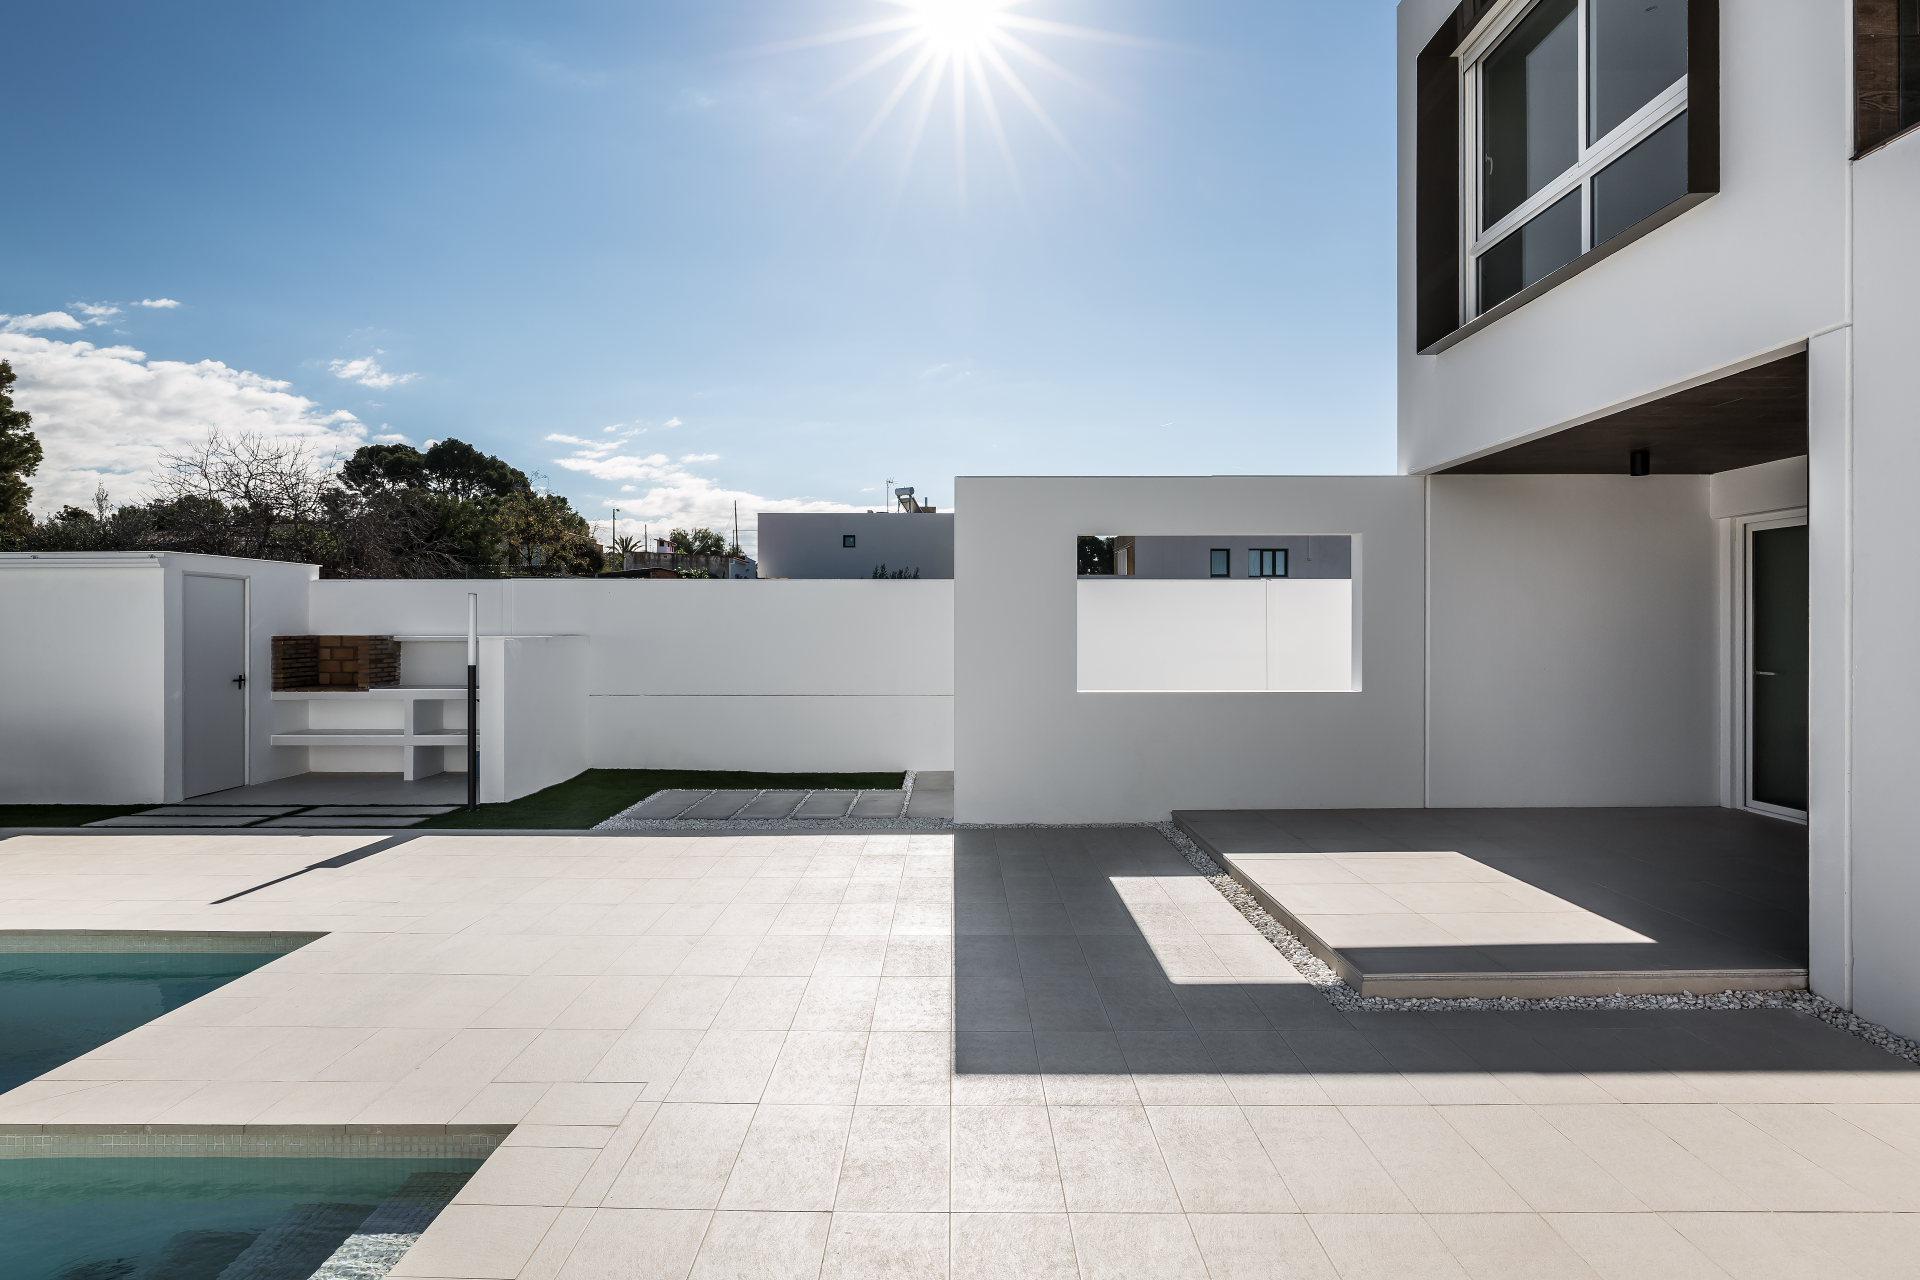 fotografia-arquitectura-valencia-german-cabo-viraje-san-antonio (9)